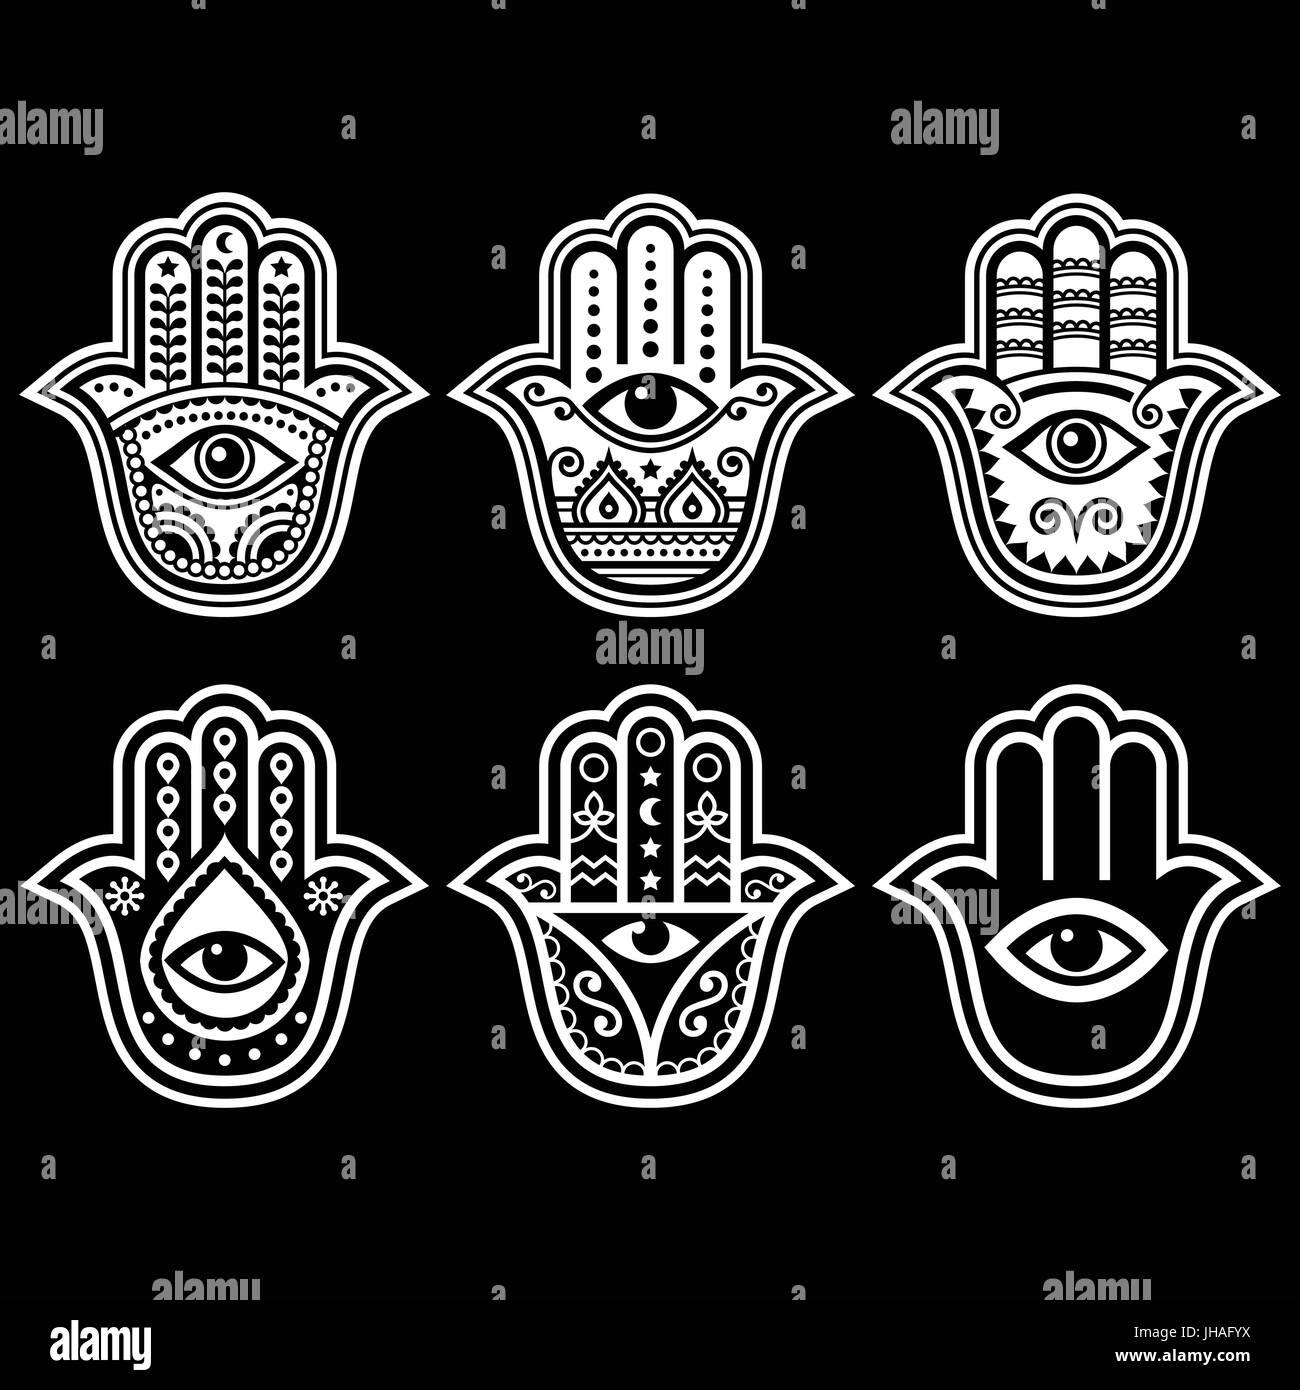 Hamsa hand, Hand of Fatima - amulet, symbol of protection from devil eye on black   Hamsa, Hand of Fatima - symbol - Stock Vector